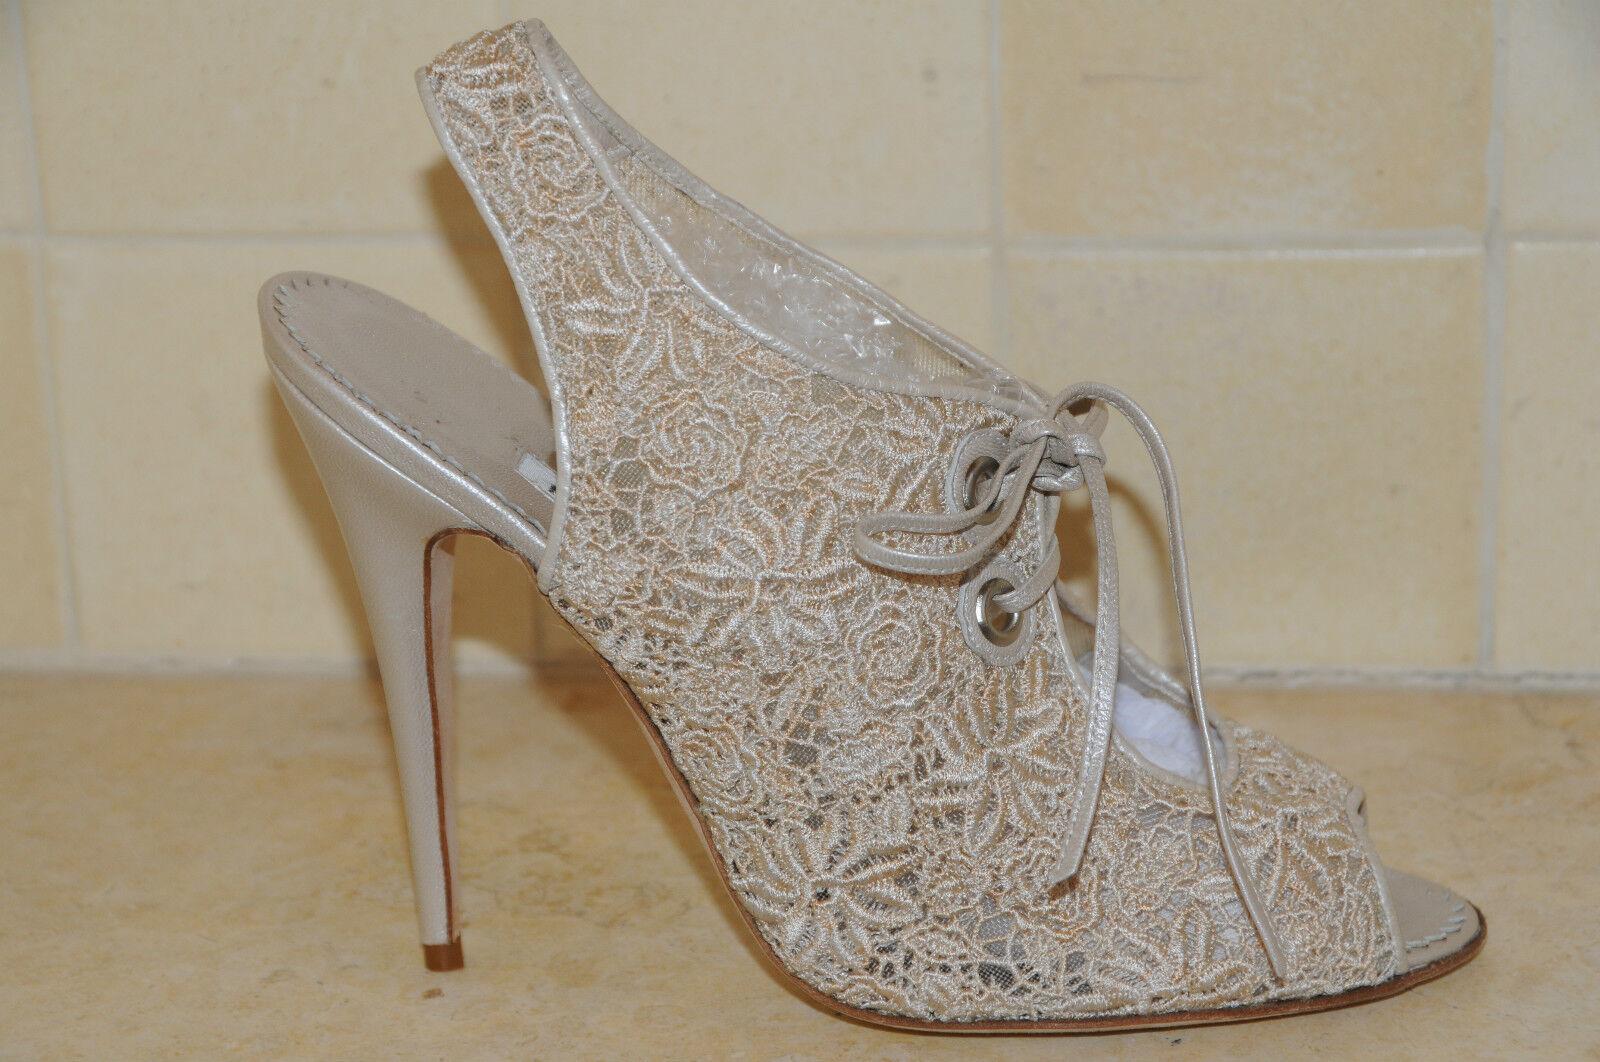 New MANOLO BLAHNIK Pearl Ivory Lace SANDALS StiefelIES schuhe 39.5 Wedding